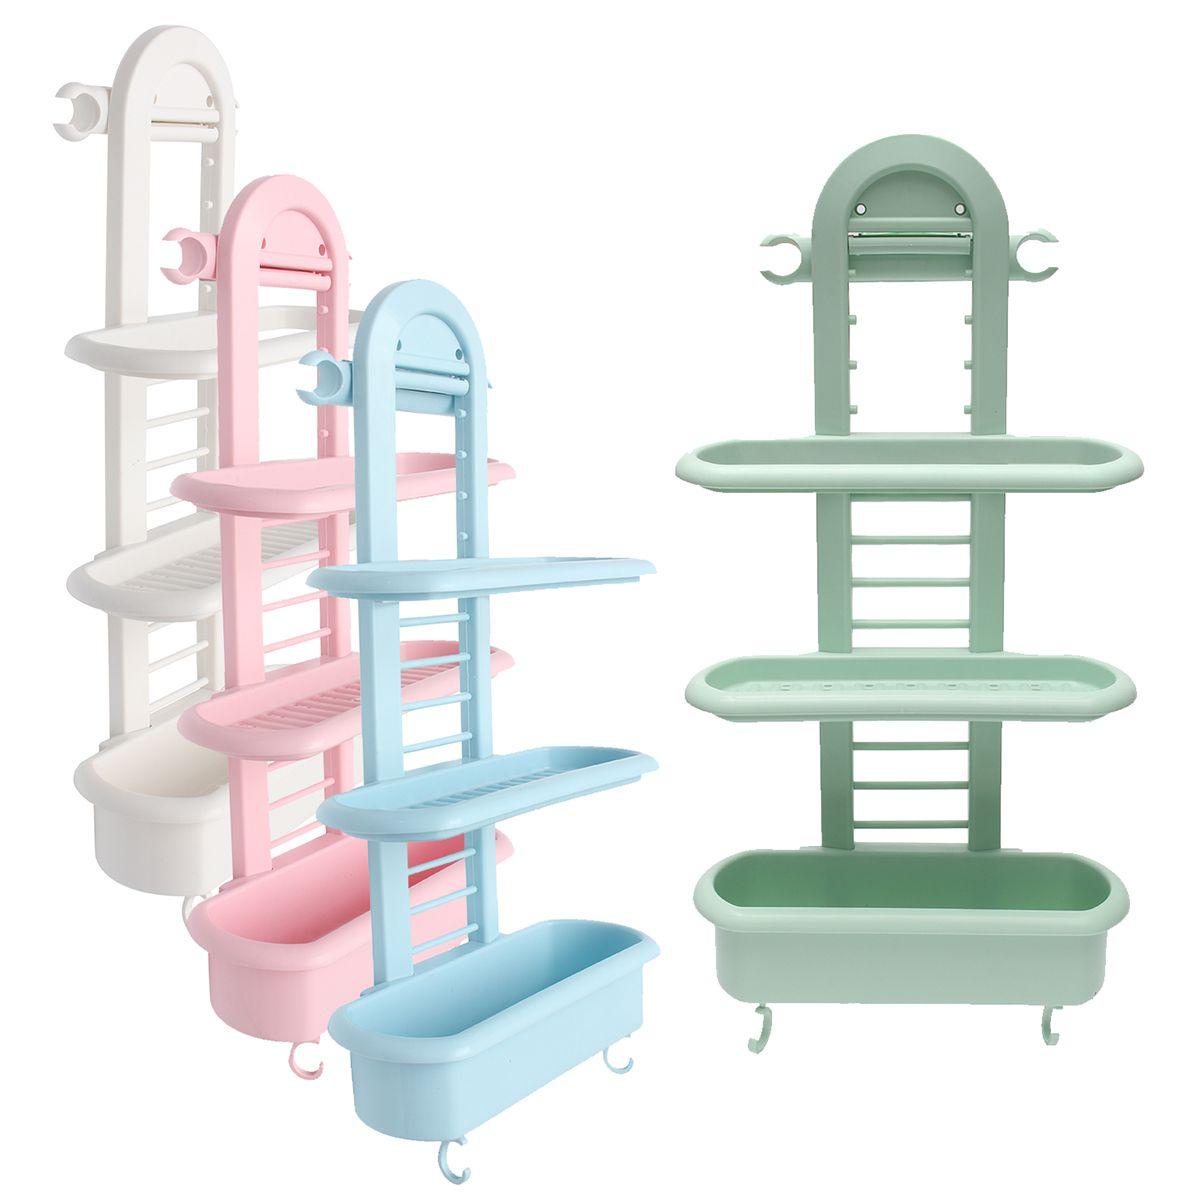 Honana BS-415 Bathroom Shower Caddy Plastic Organizer Shelves ...